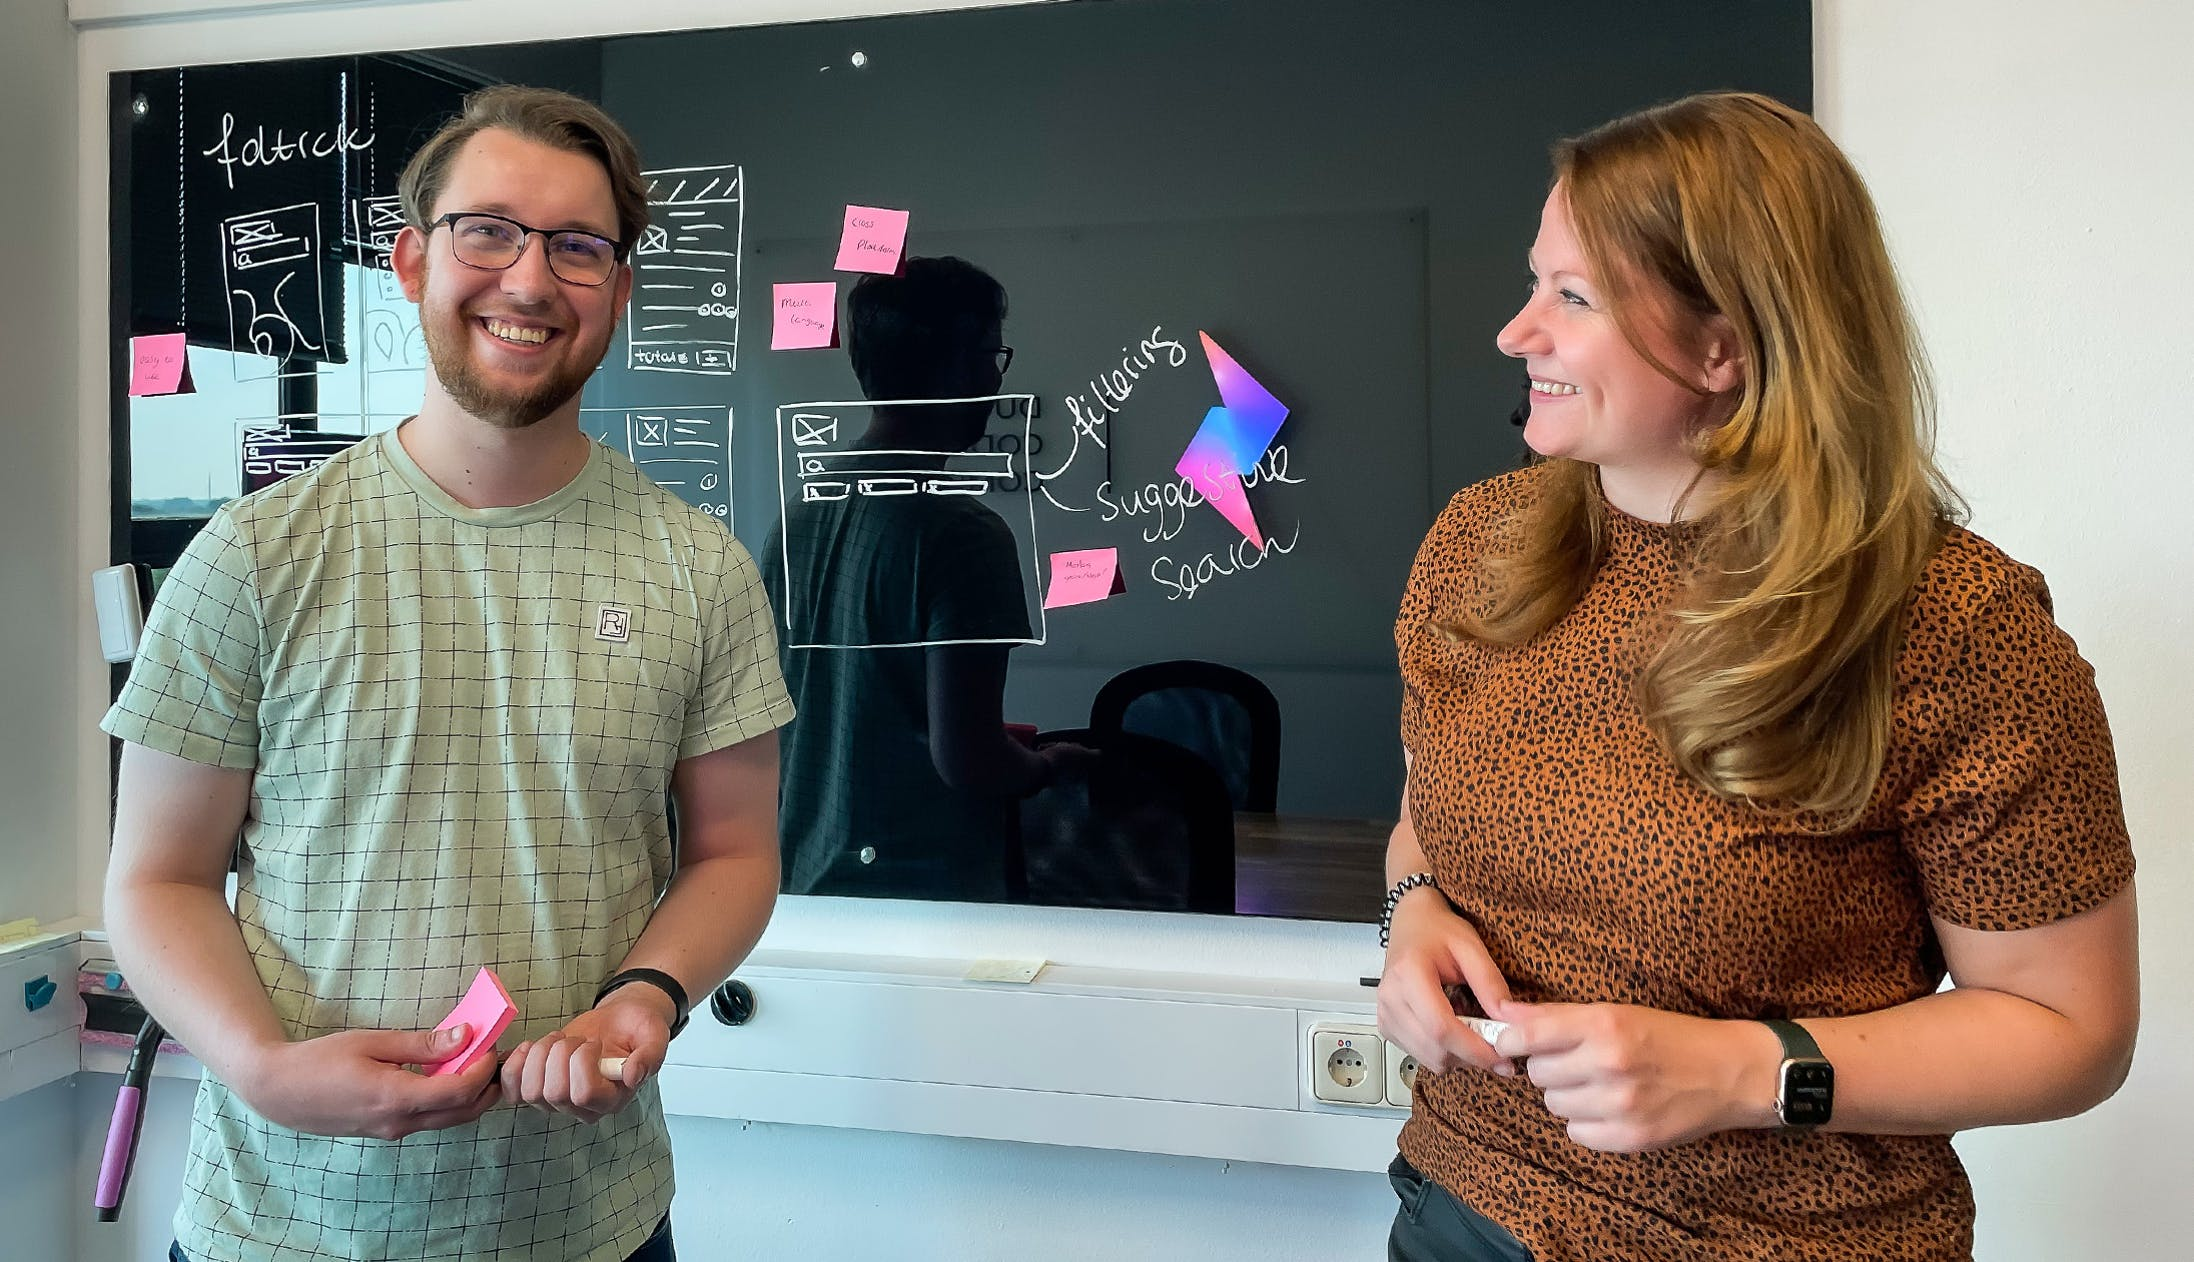 Developer Stijn and designer Sanne